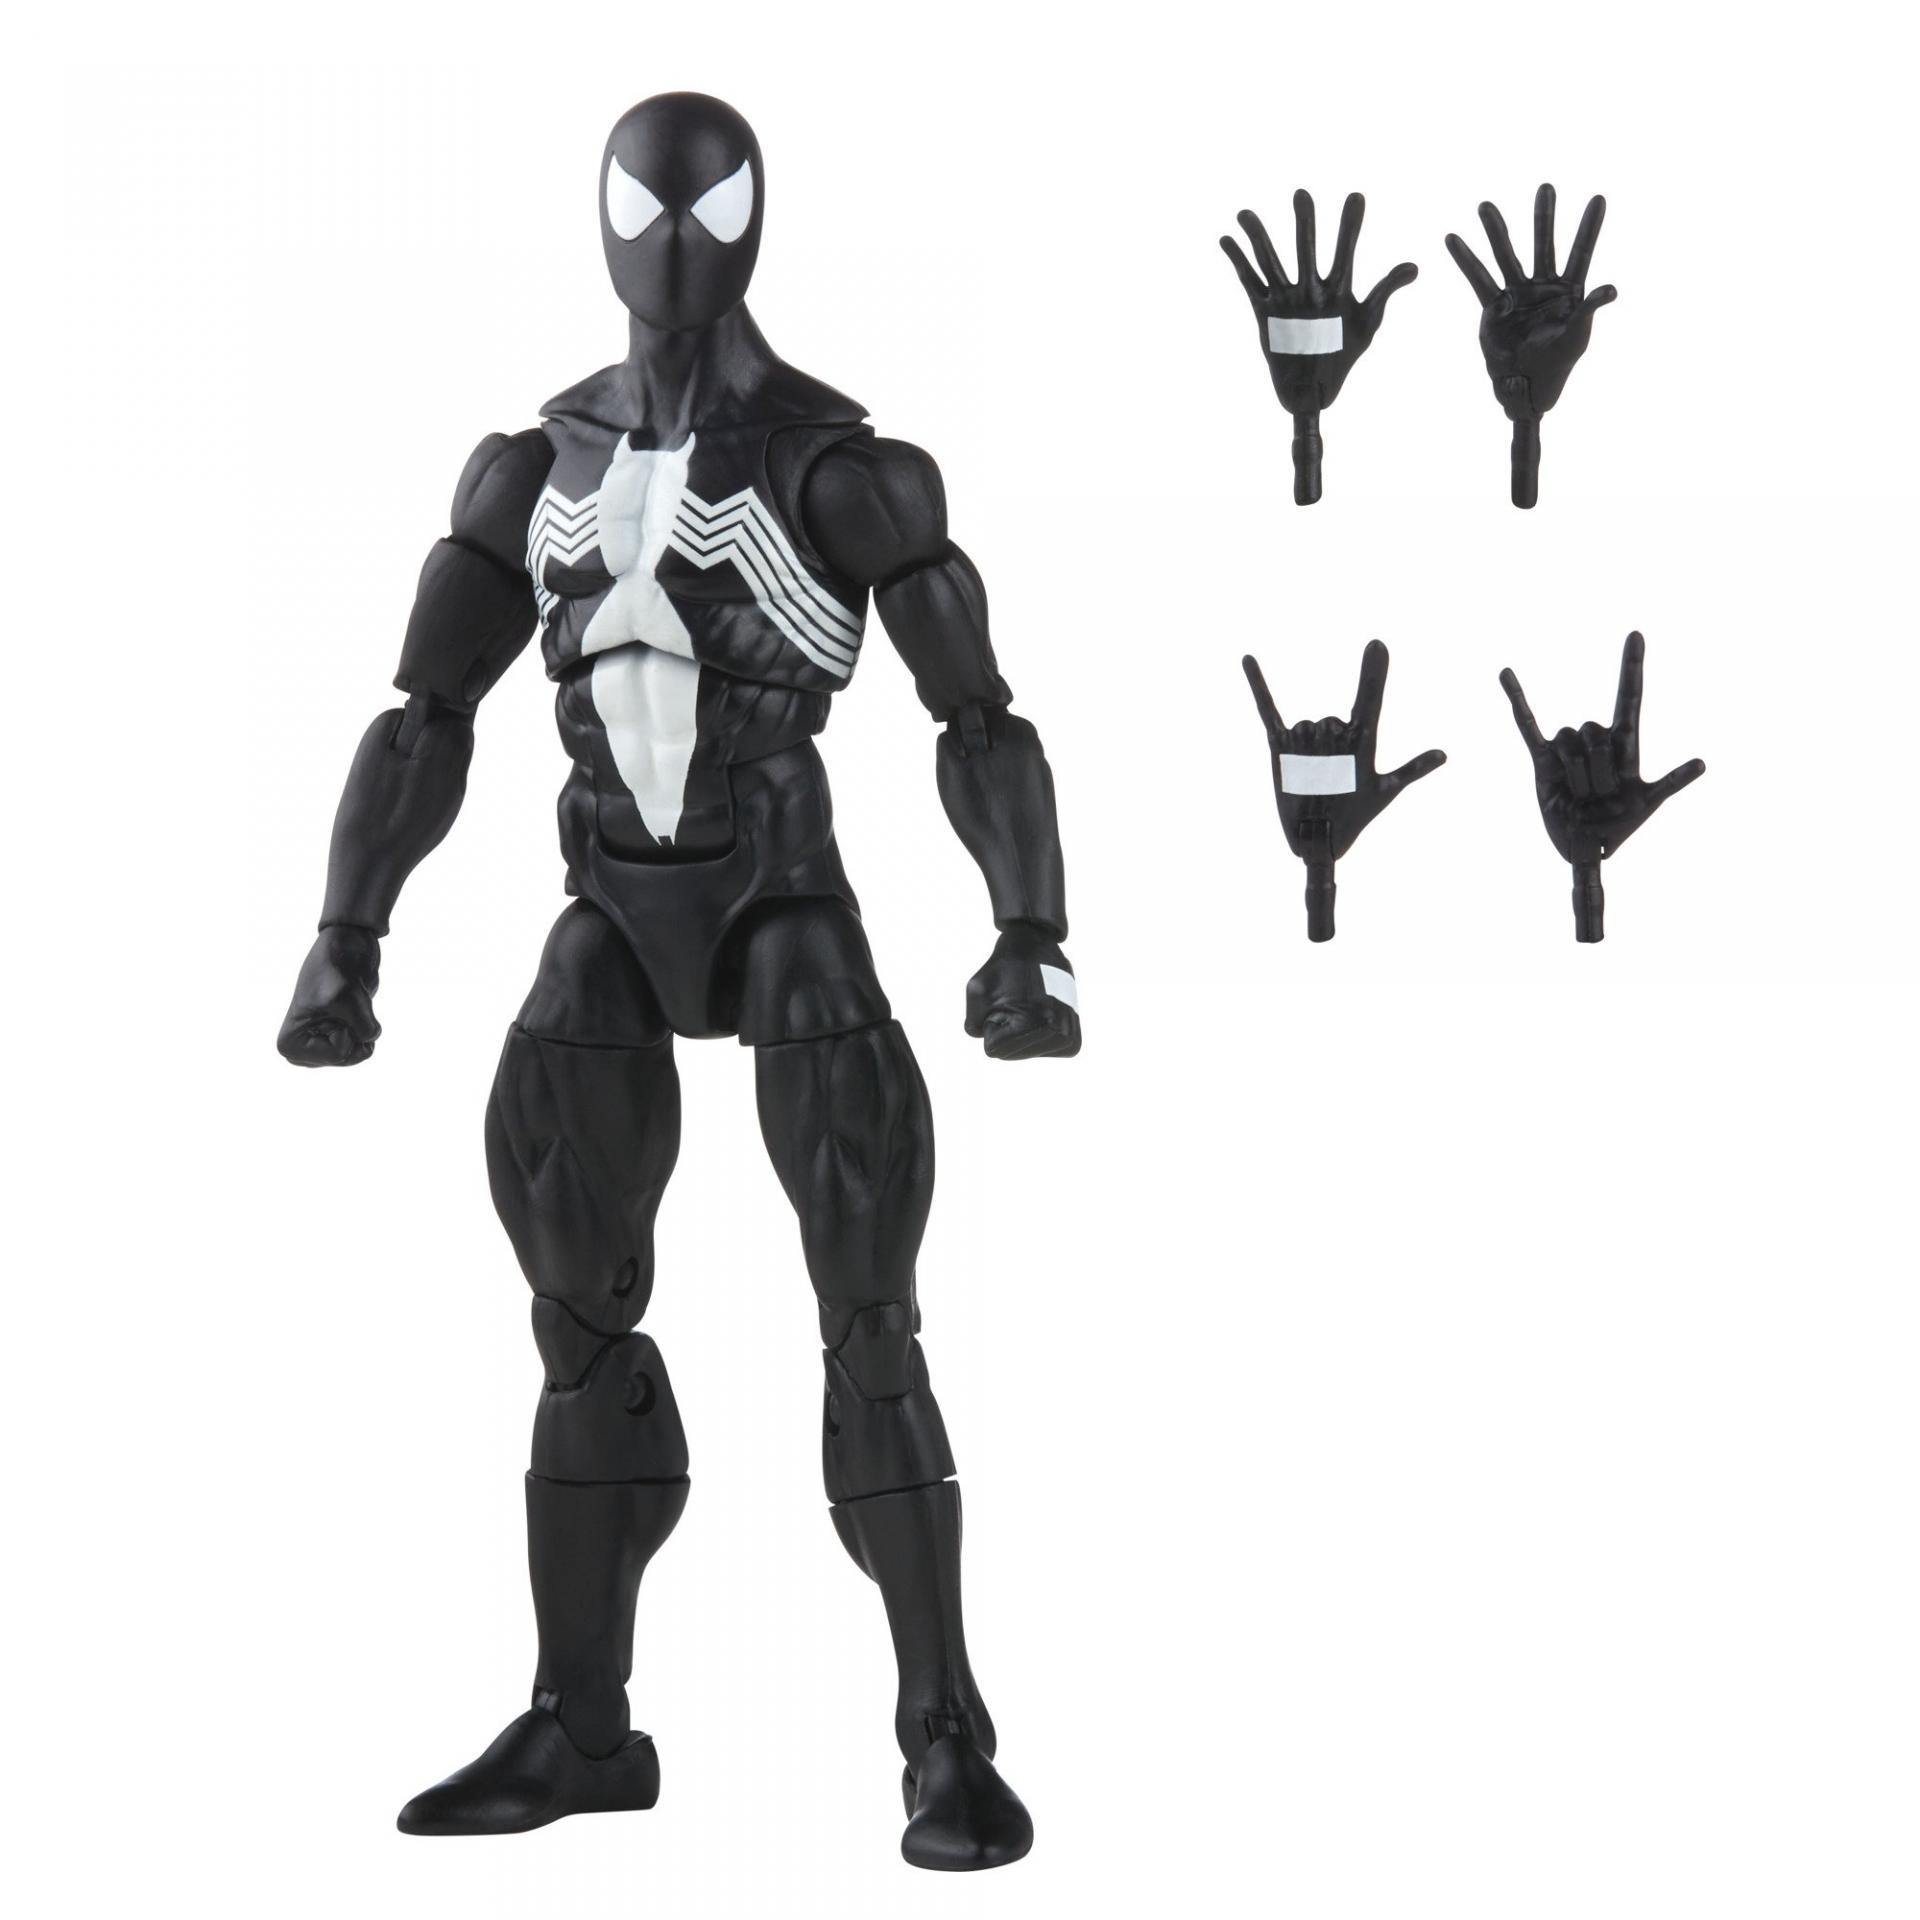 Marvel legends series hasbro symbiote spider man8